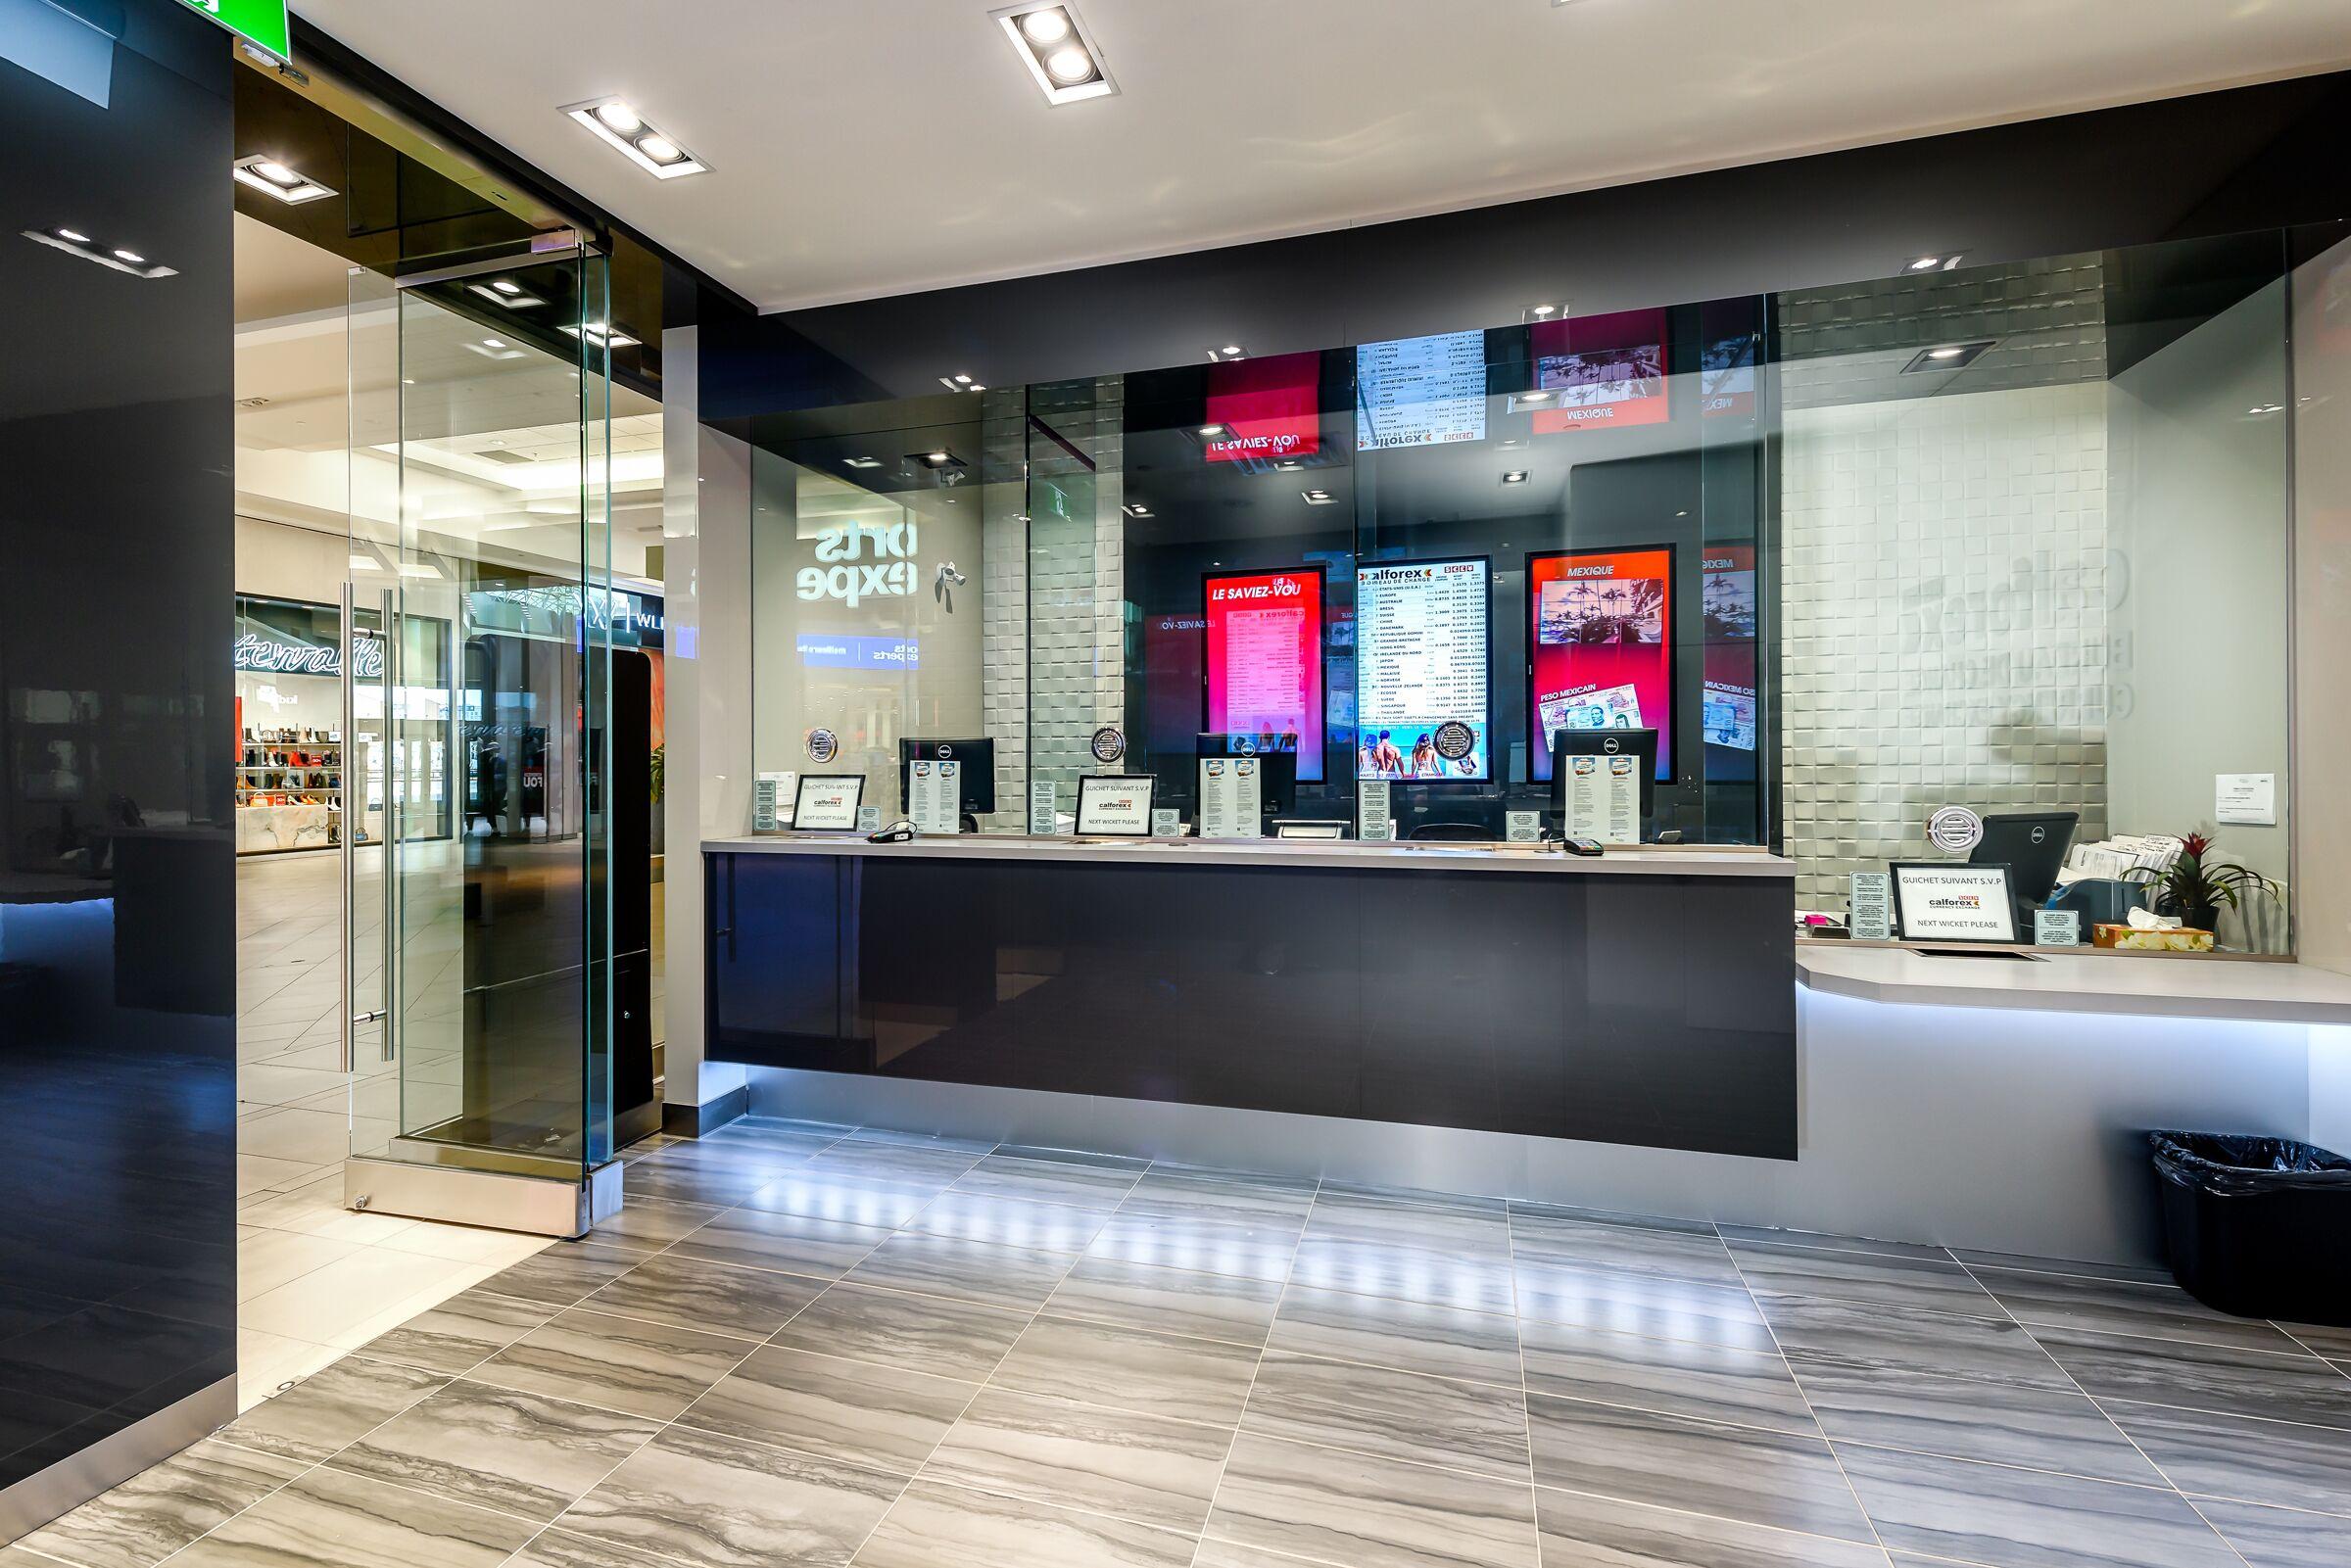 Calforex Exchange, CF Carrefour Laval – Photo 3